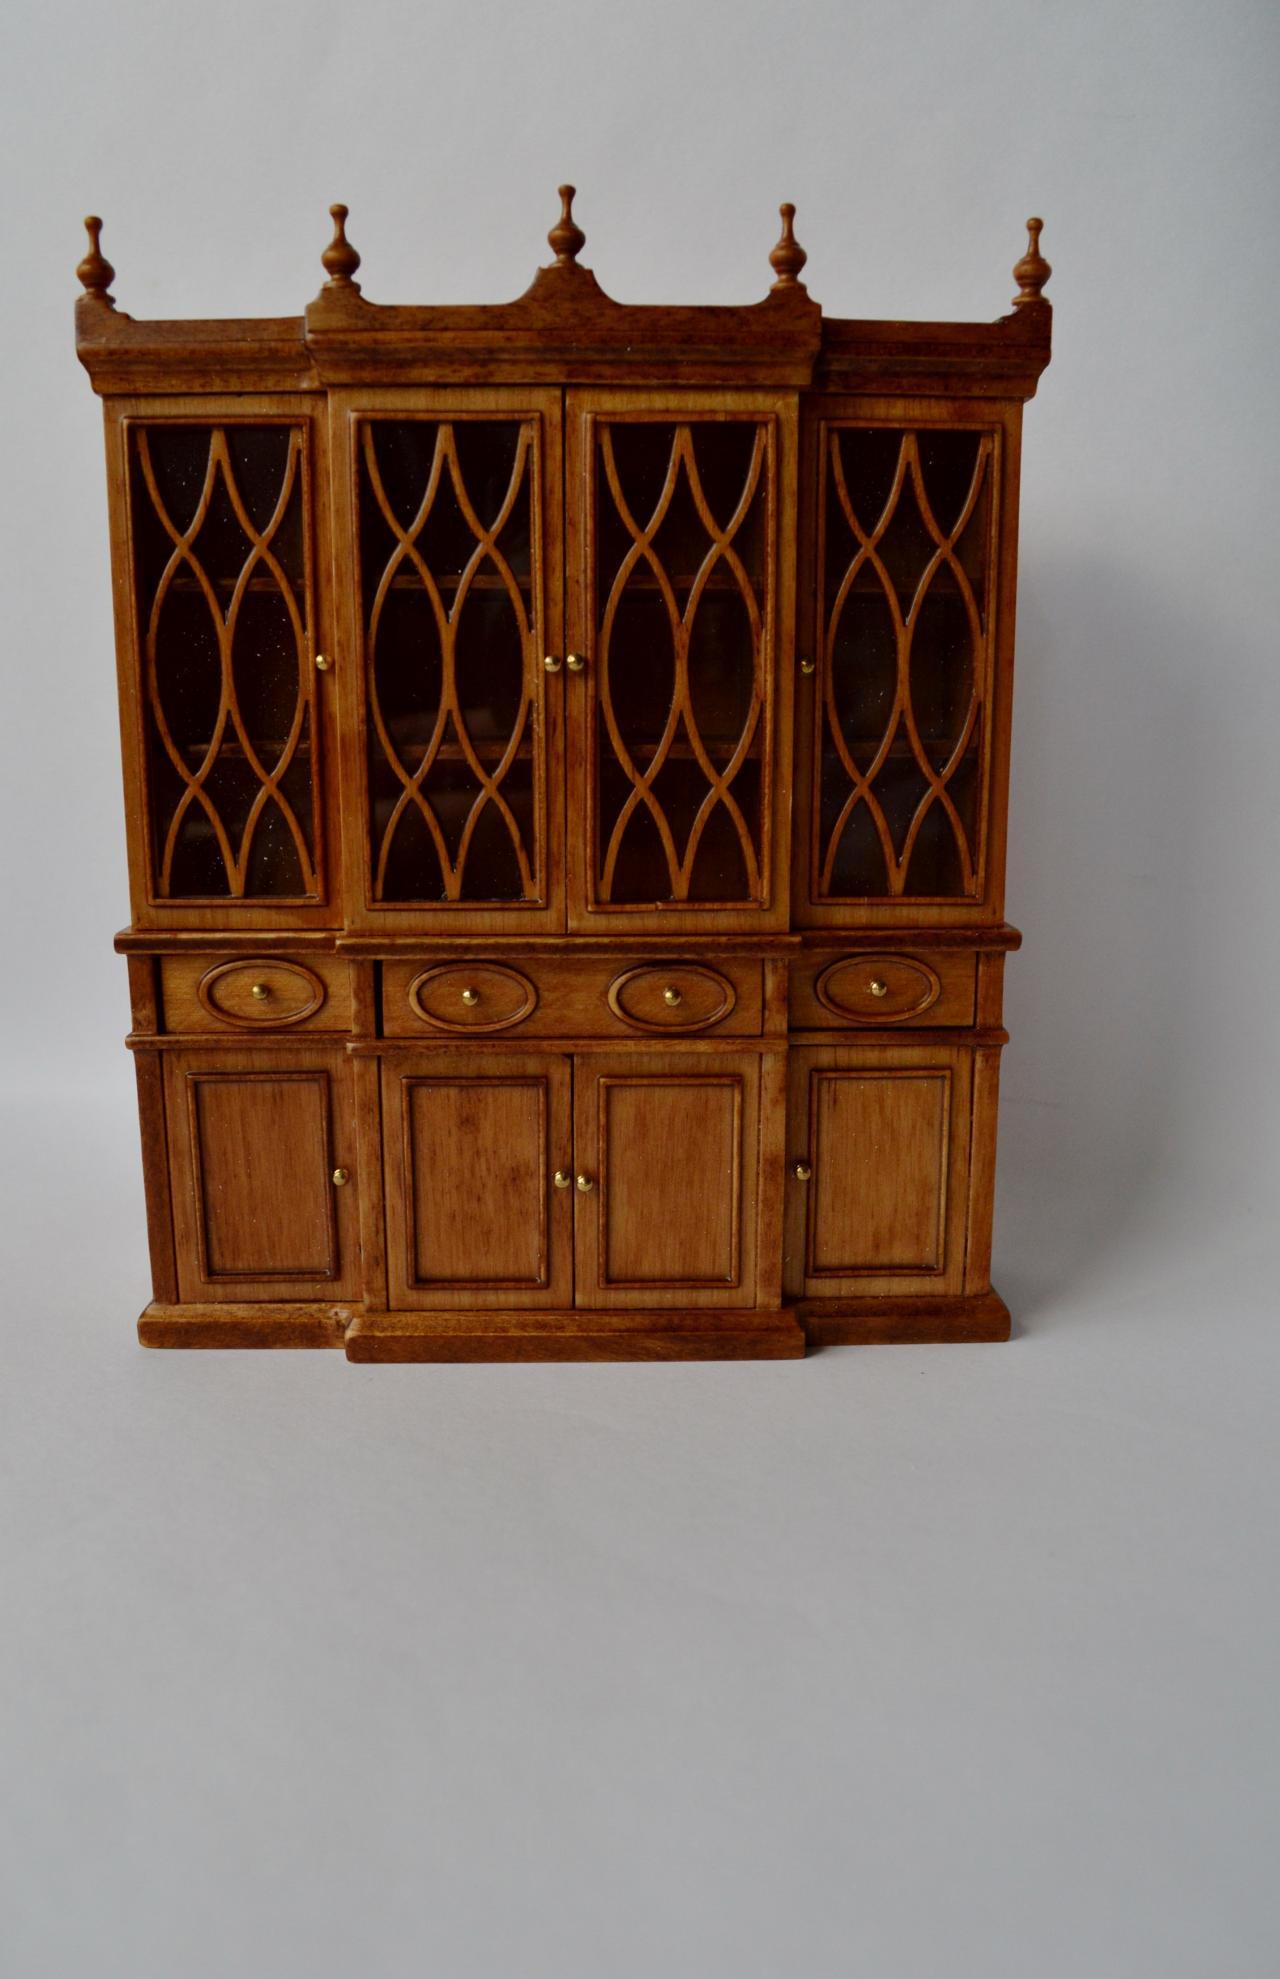 Dollhouse Famous Maker Furniture 12090 Tudor Style